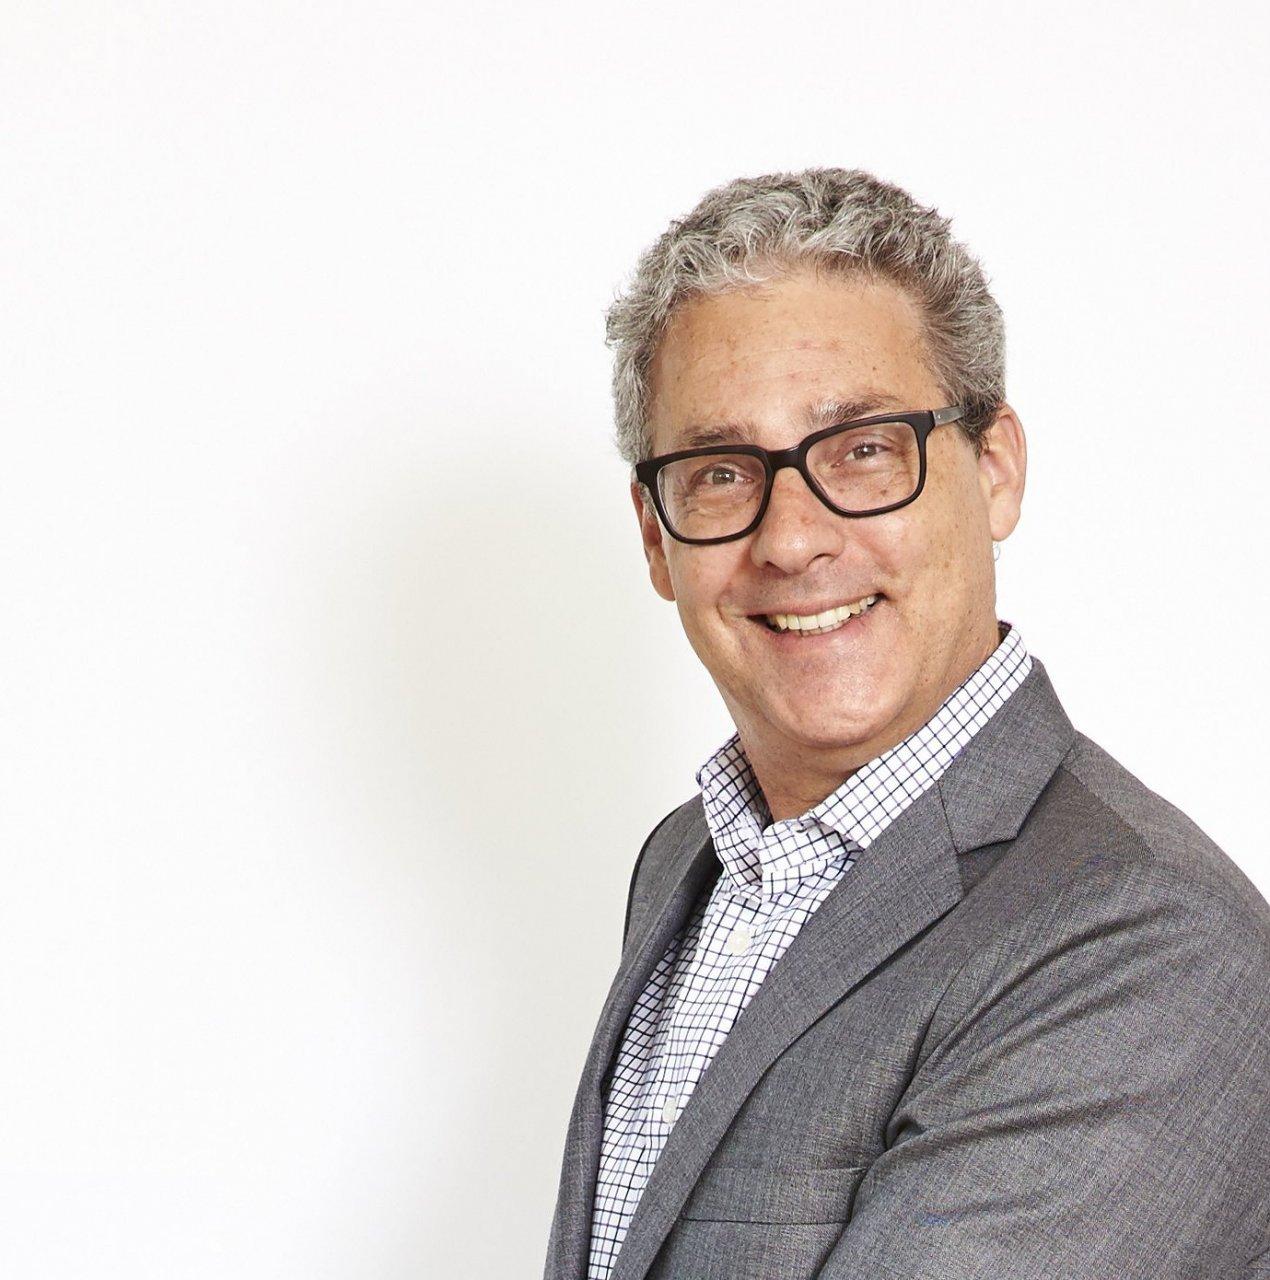 Darren Isenberg